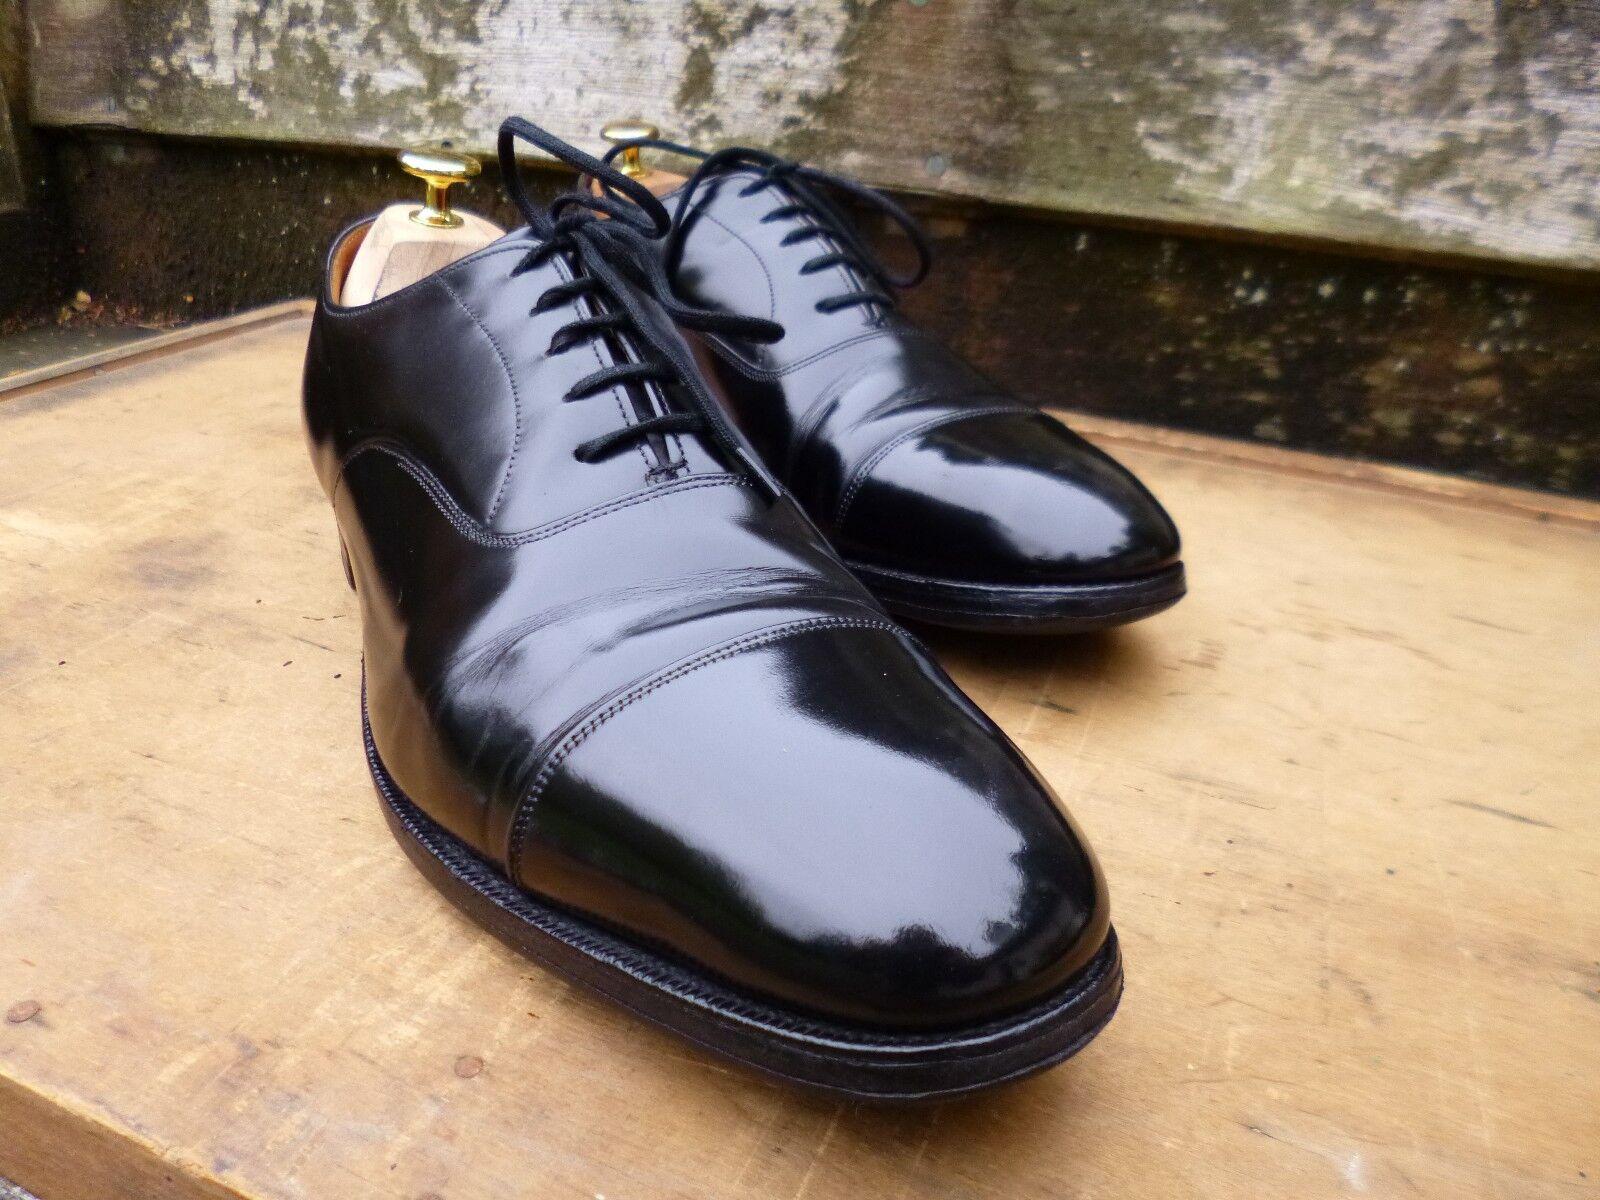 CHURCH VINTAGE OXFORD - BLACK BLACK BLACK – BALMORAL – UK 10.5 (NARROW) –EXCELLENT CONDITION 2f3125